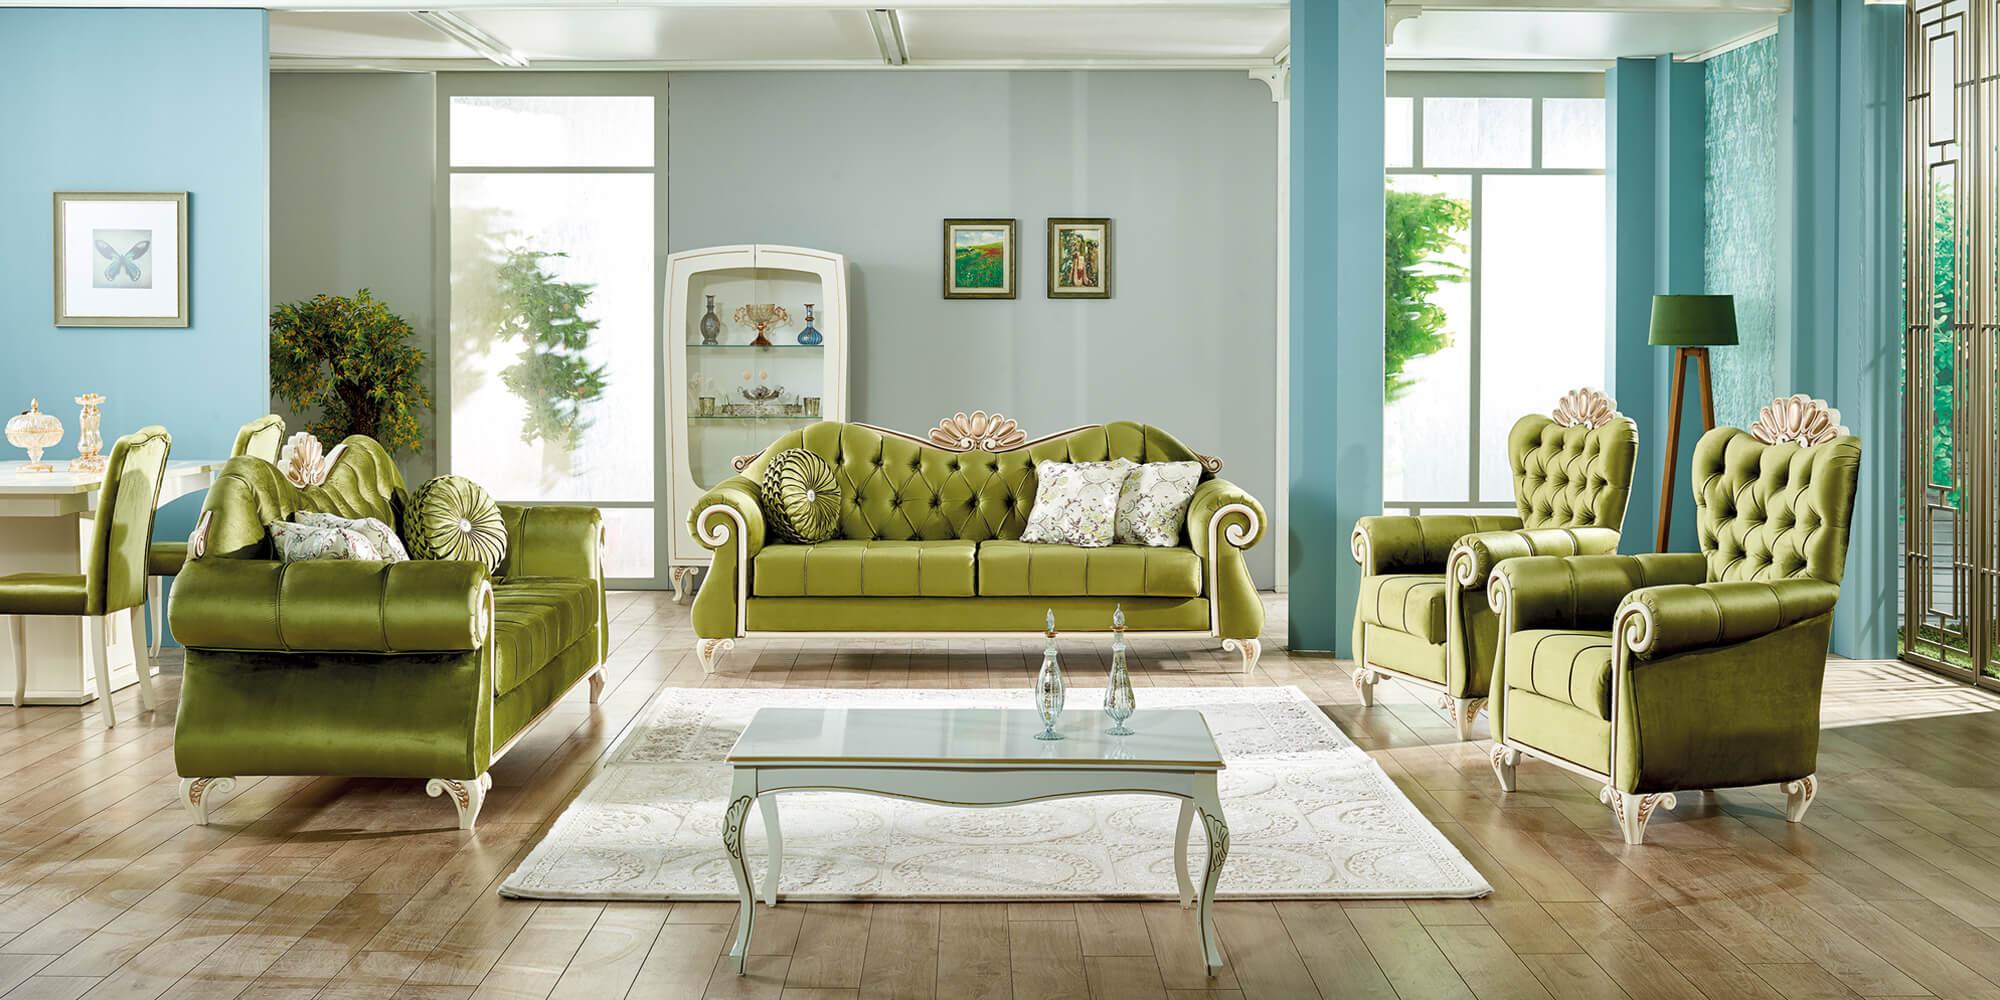 asur 3 2 1 sofa set yuvam m belhaus in wuppertal cilek offizieller h ndler in europa. Black Bedroom Furniture Sets. Home Design Ideas